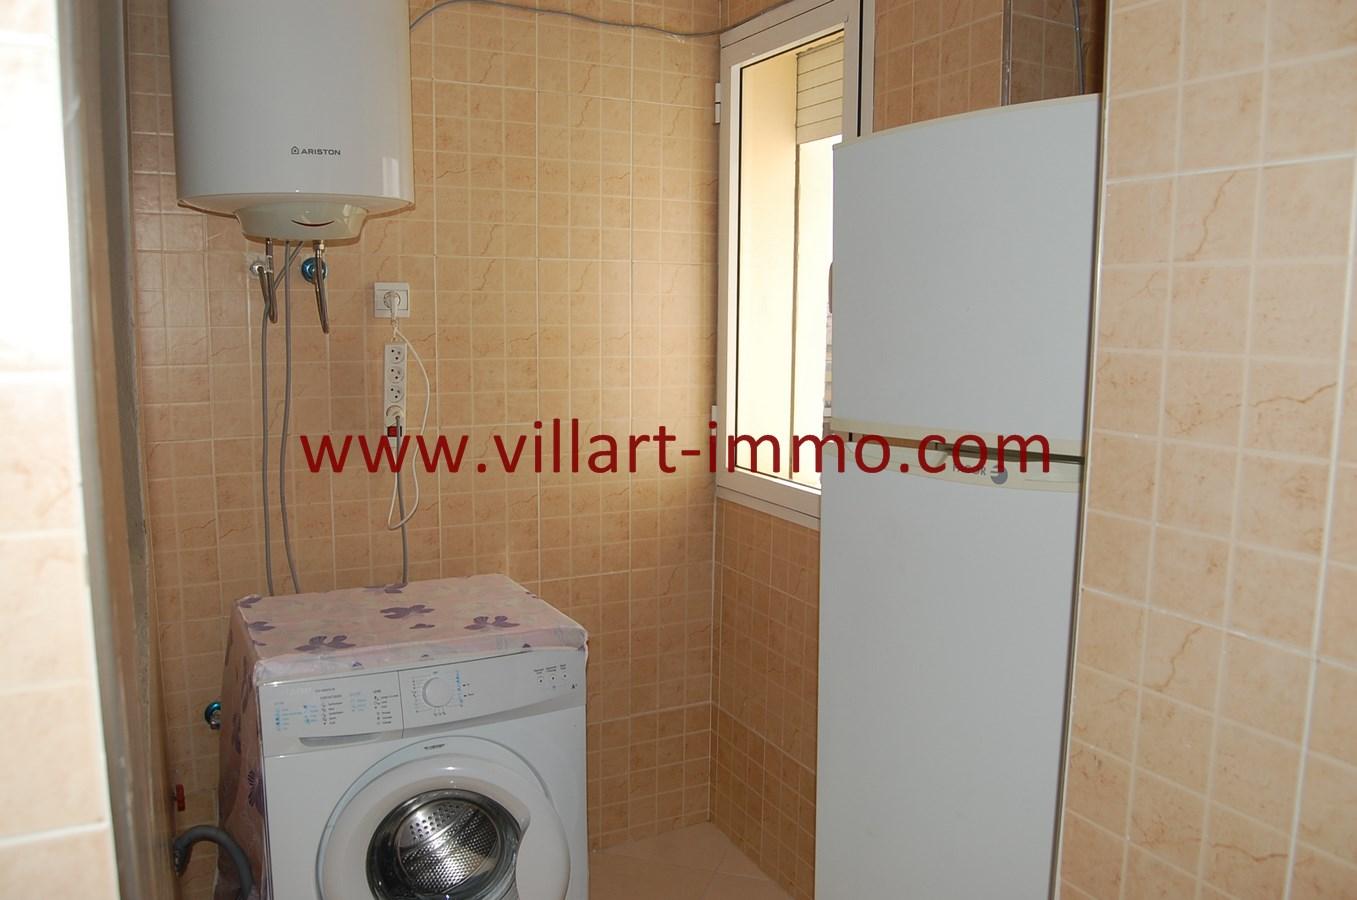 9-Vente-Appartement-Tanger-Route de Rabat-Buanderie-VA494-Villart Immo